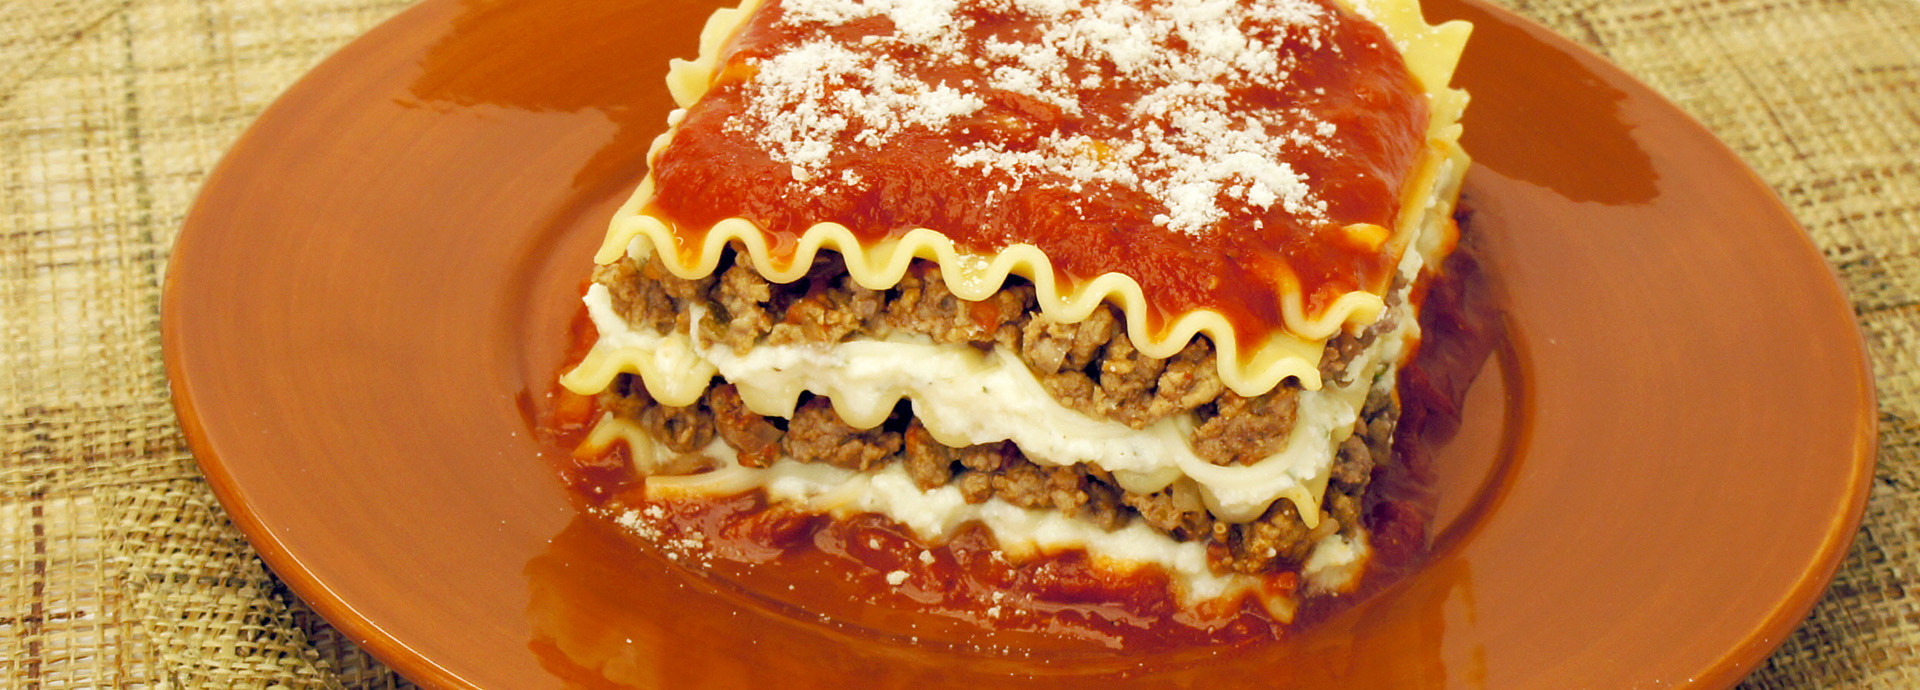 Creamette Classic Lasagna